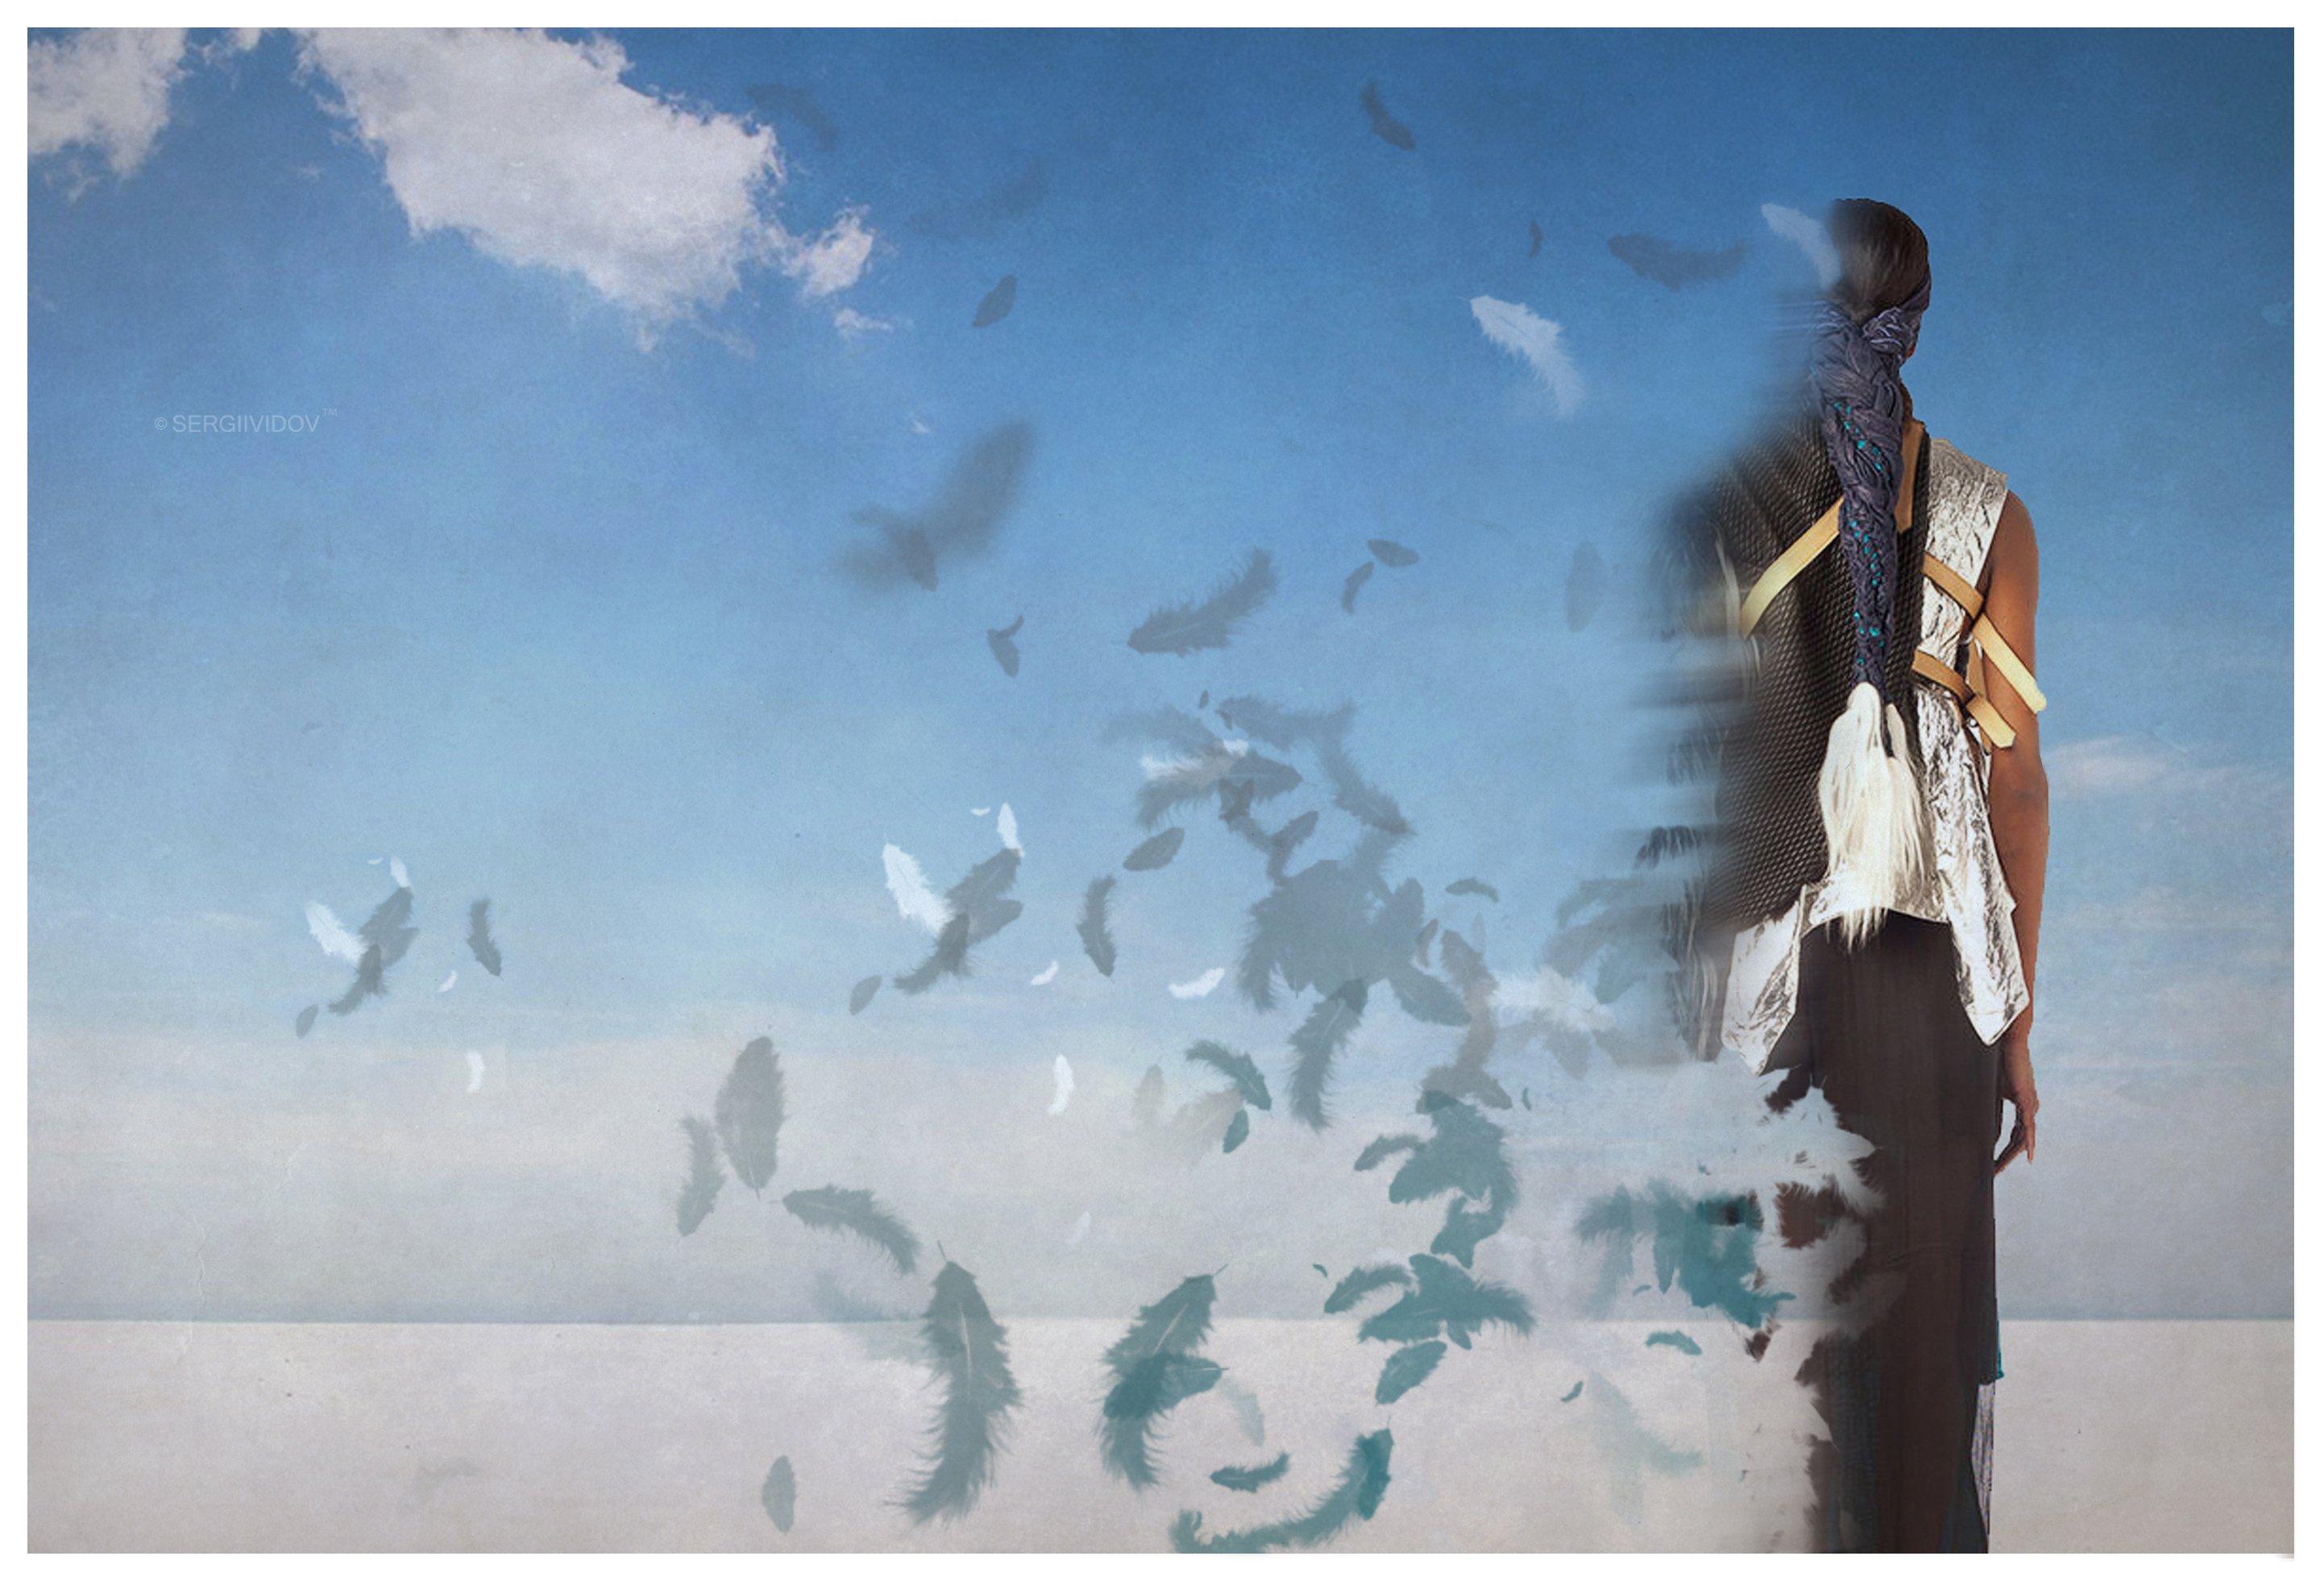 девушка, пустыня, перо, небо, Sergii Vidov